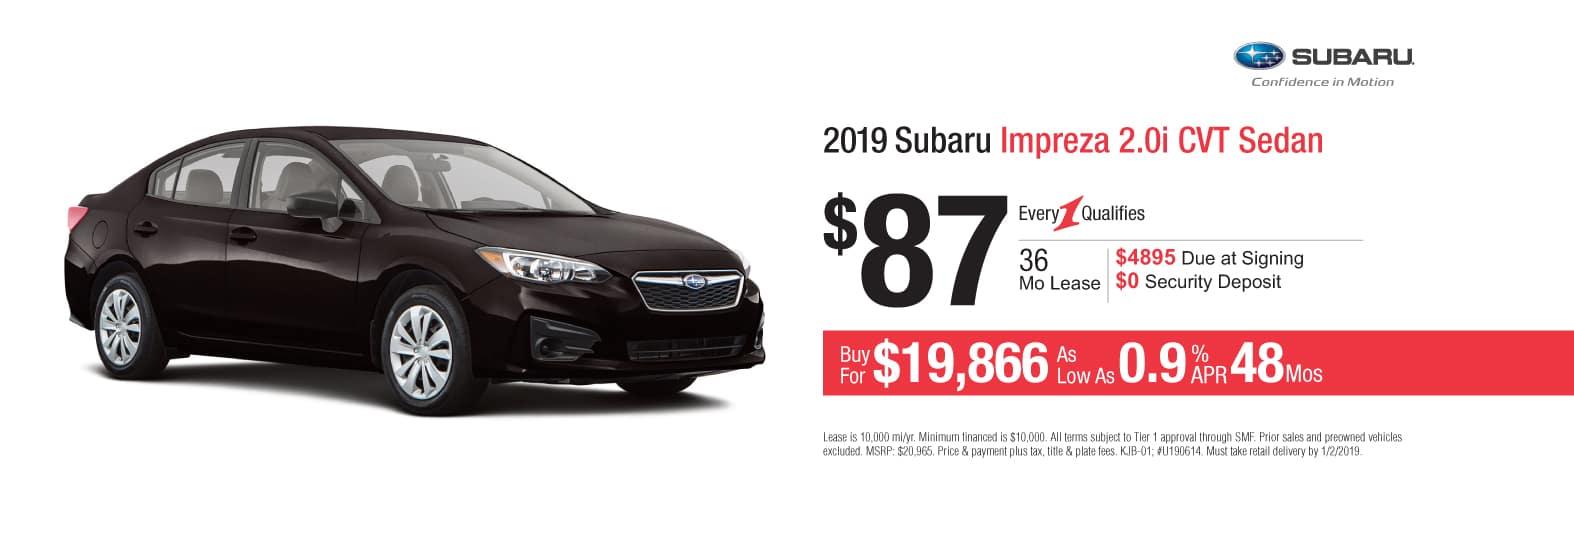 New Car Specials At Cochran Subaru In Allegheny County Near Pittsburgh